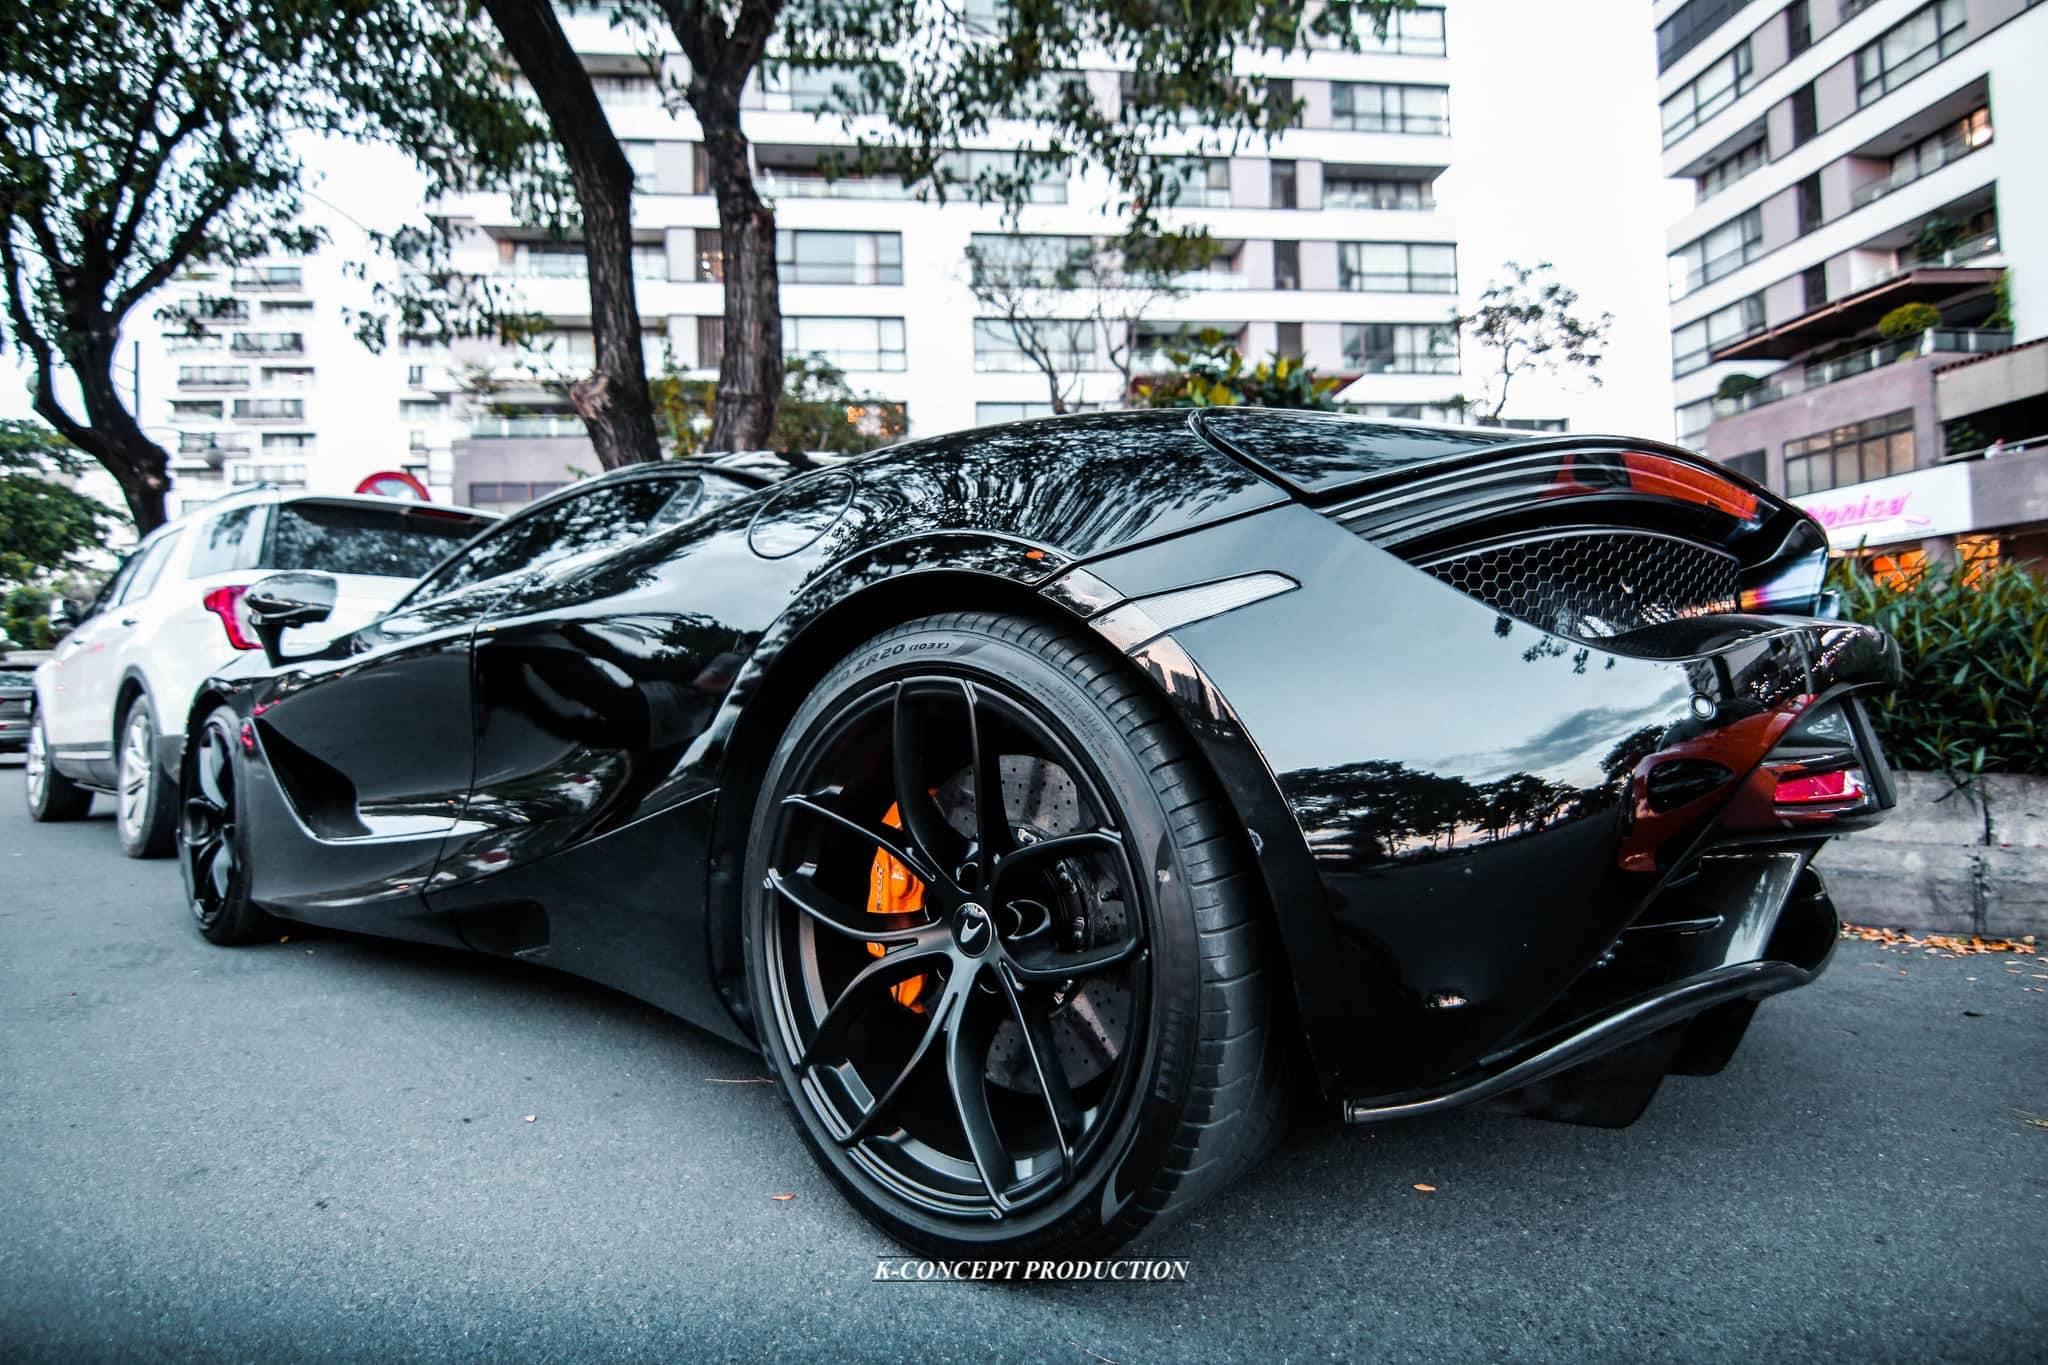 Siêu xe McLaren 720S Spider